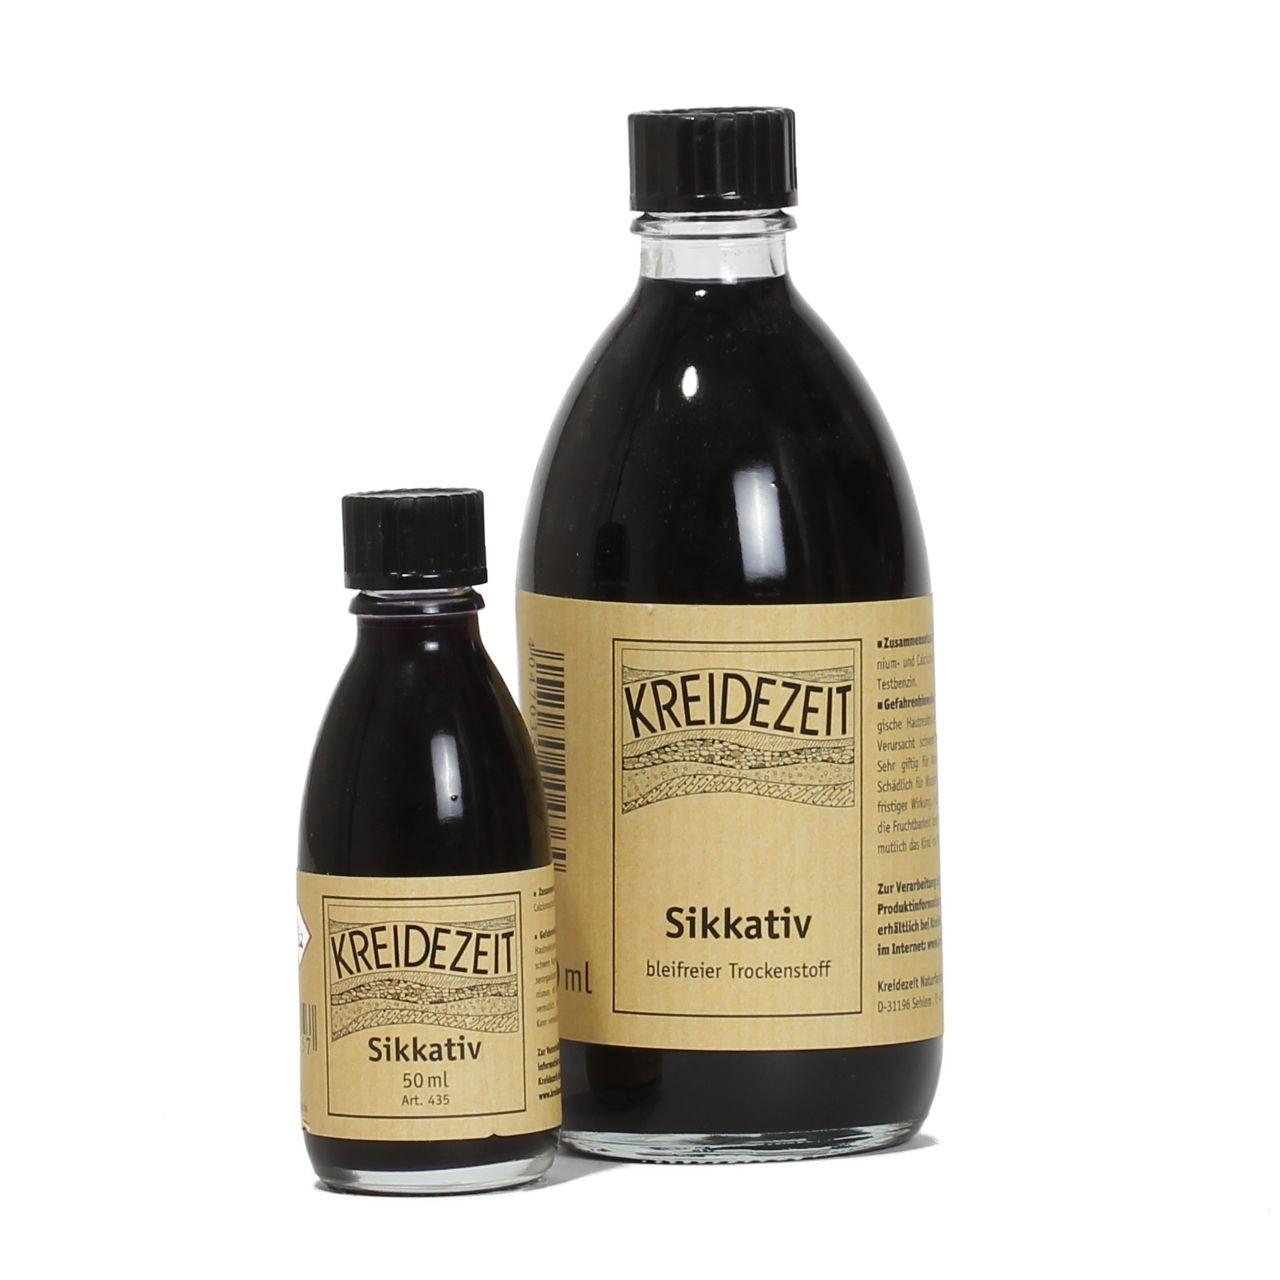 Kreidezeit Sikkativ 250 ml